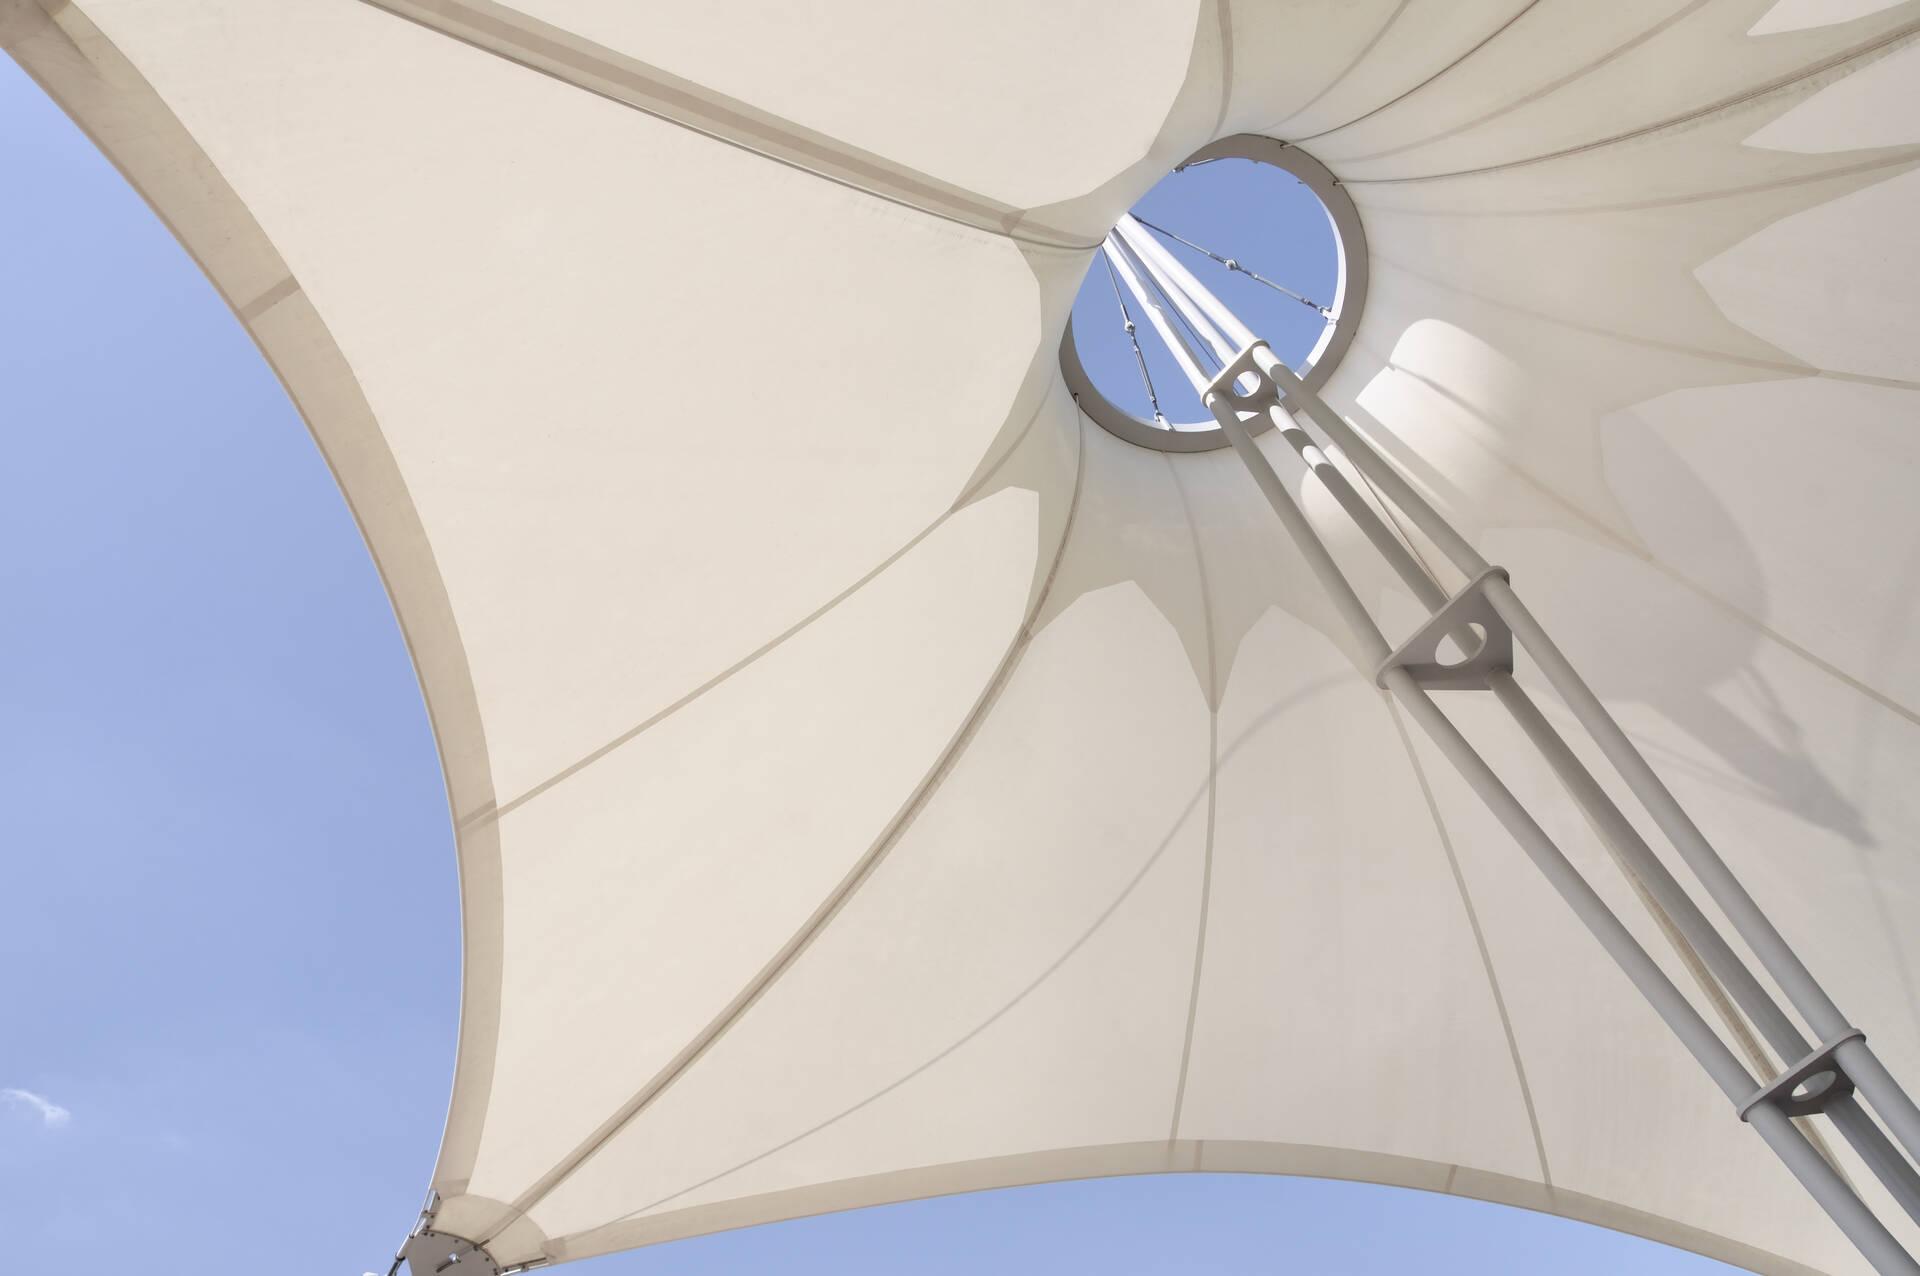 sattler-arquitectura textil